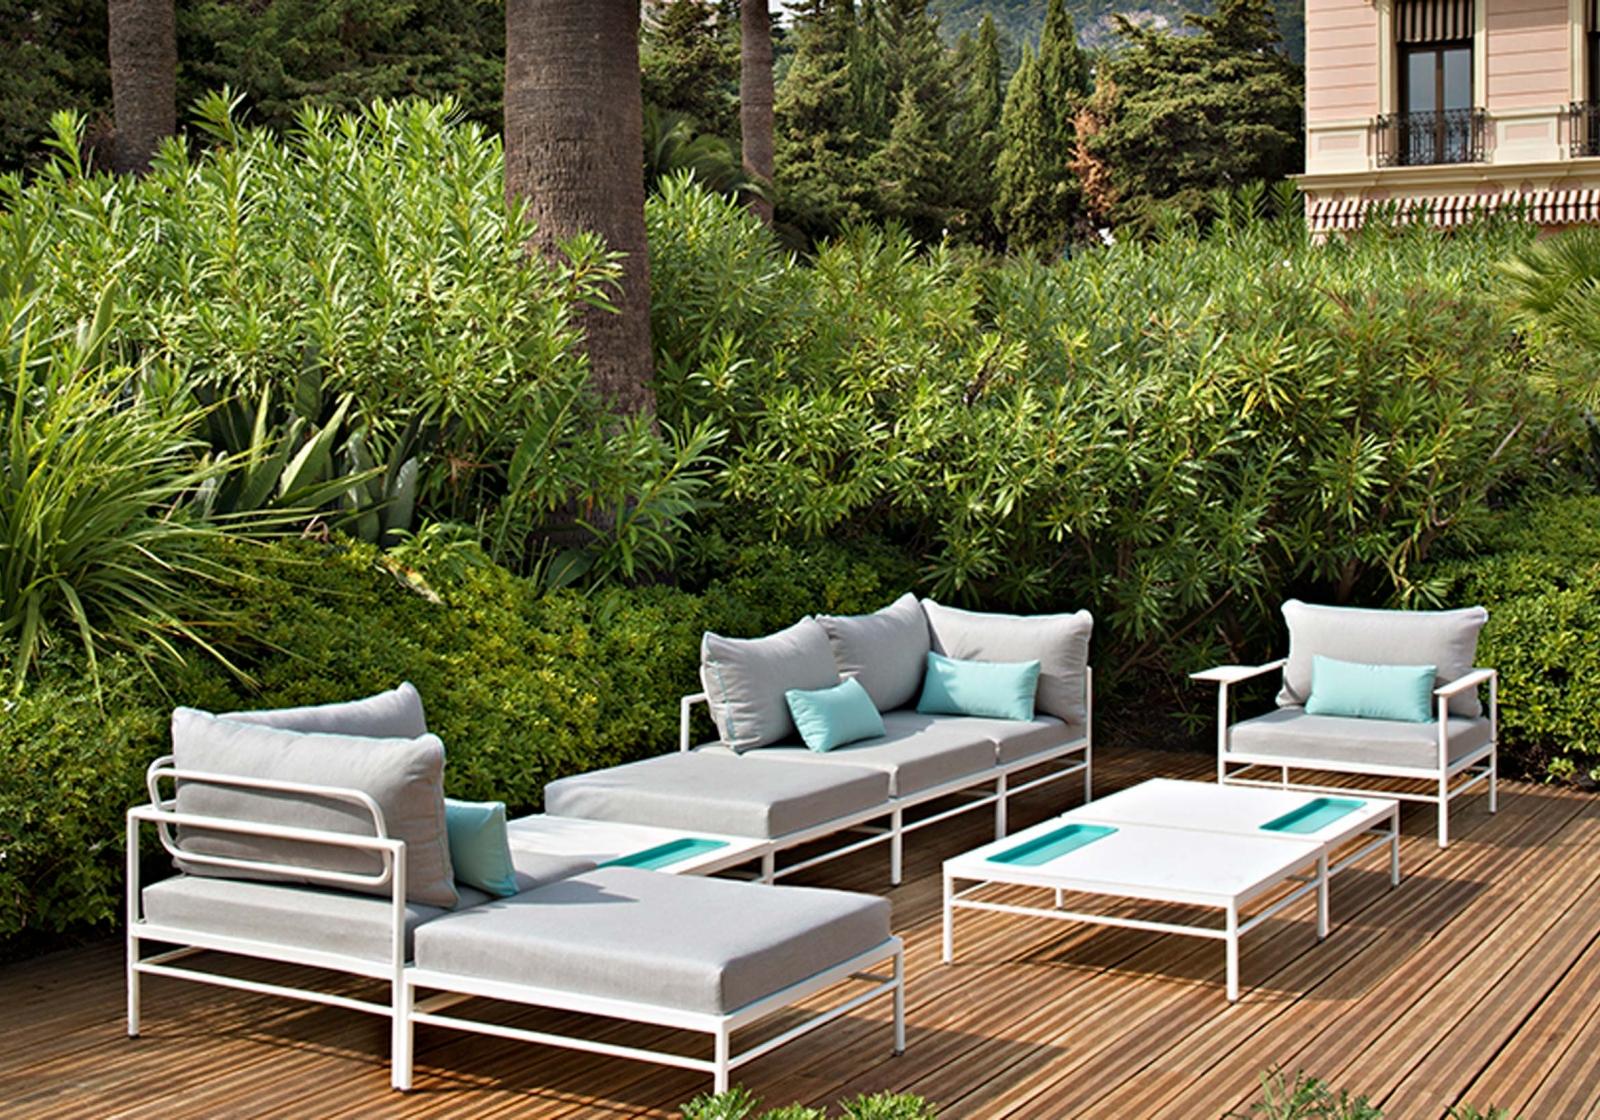 mobilier de jardin design pour profiter du jardin salon d. Black Bedroom Furniture Sets. Home Design Ideas